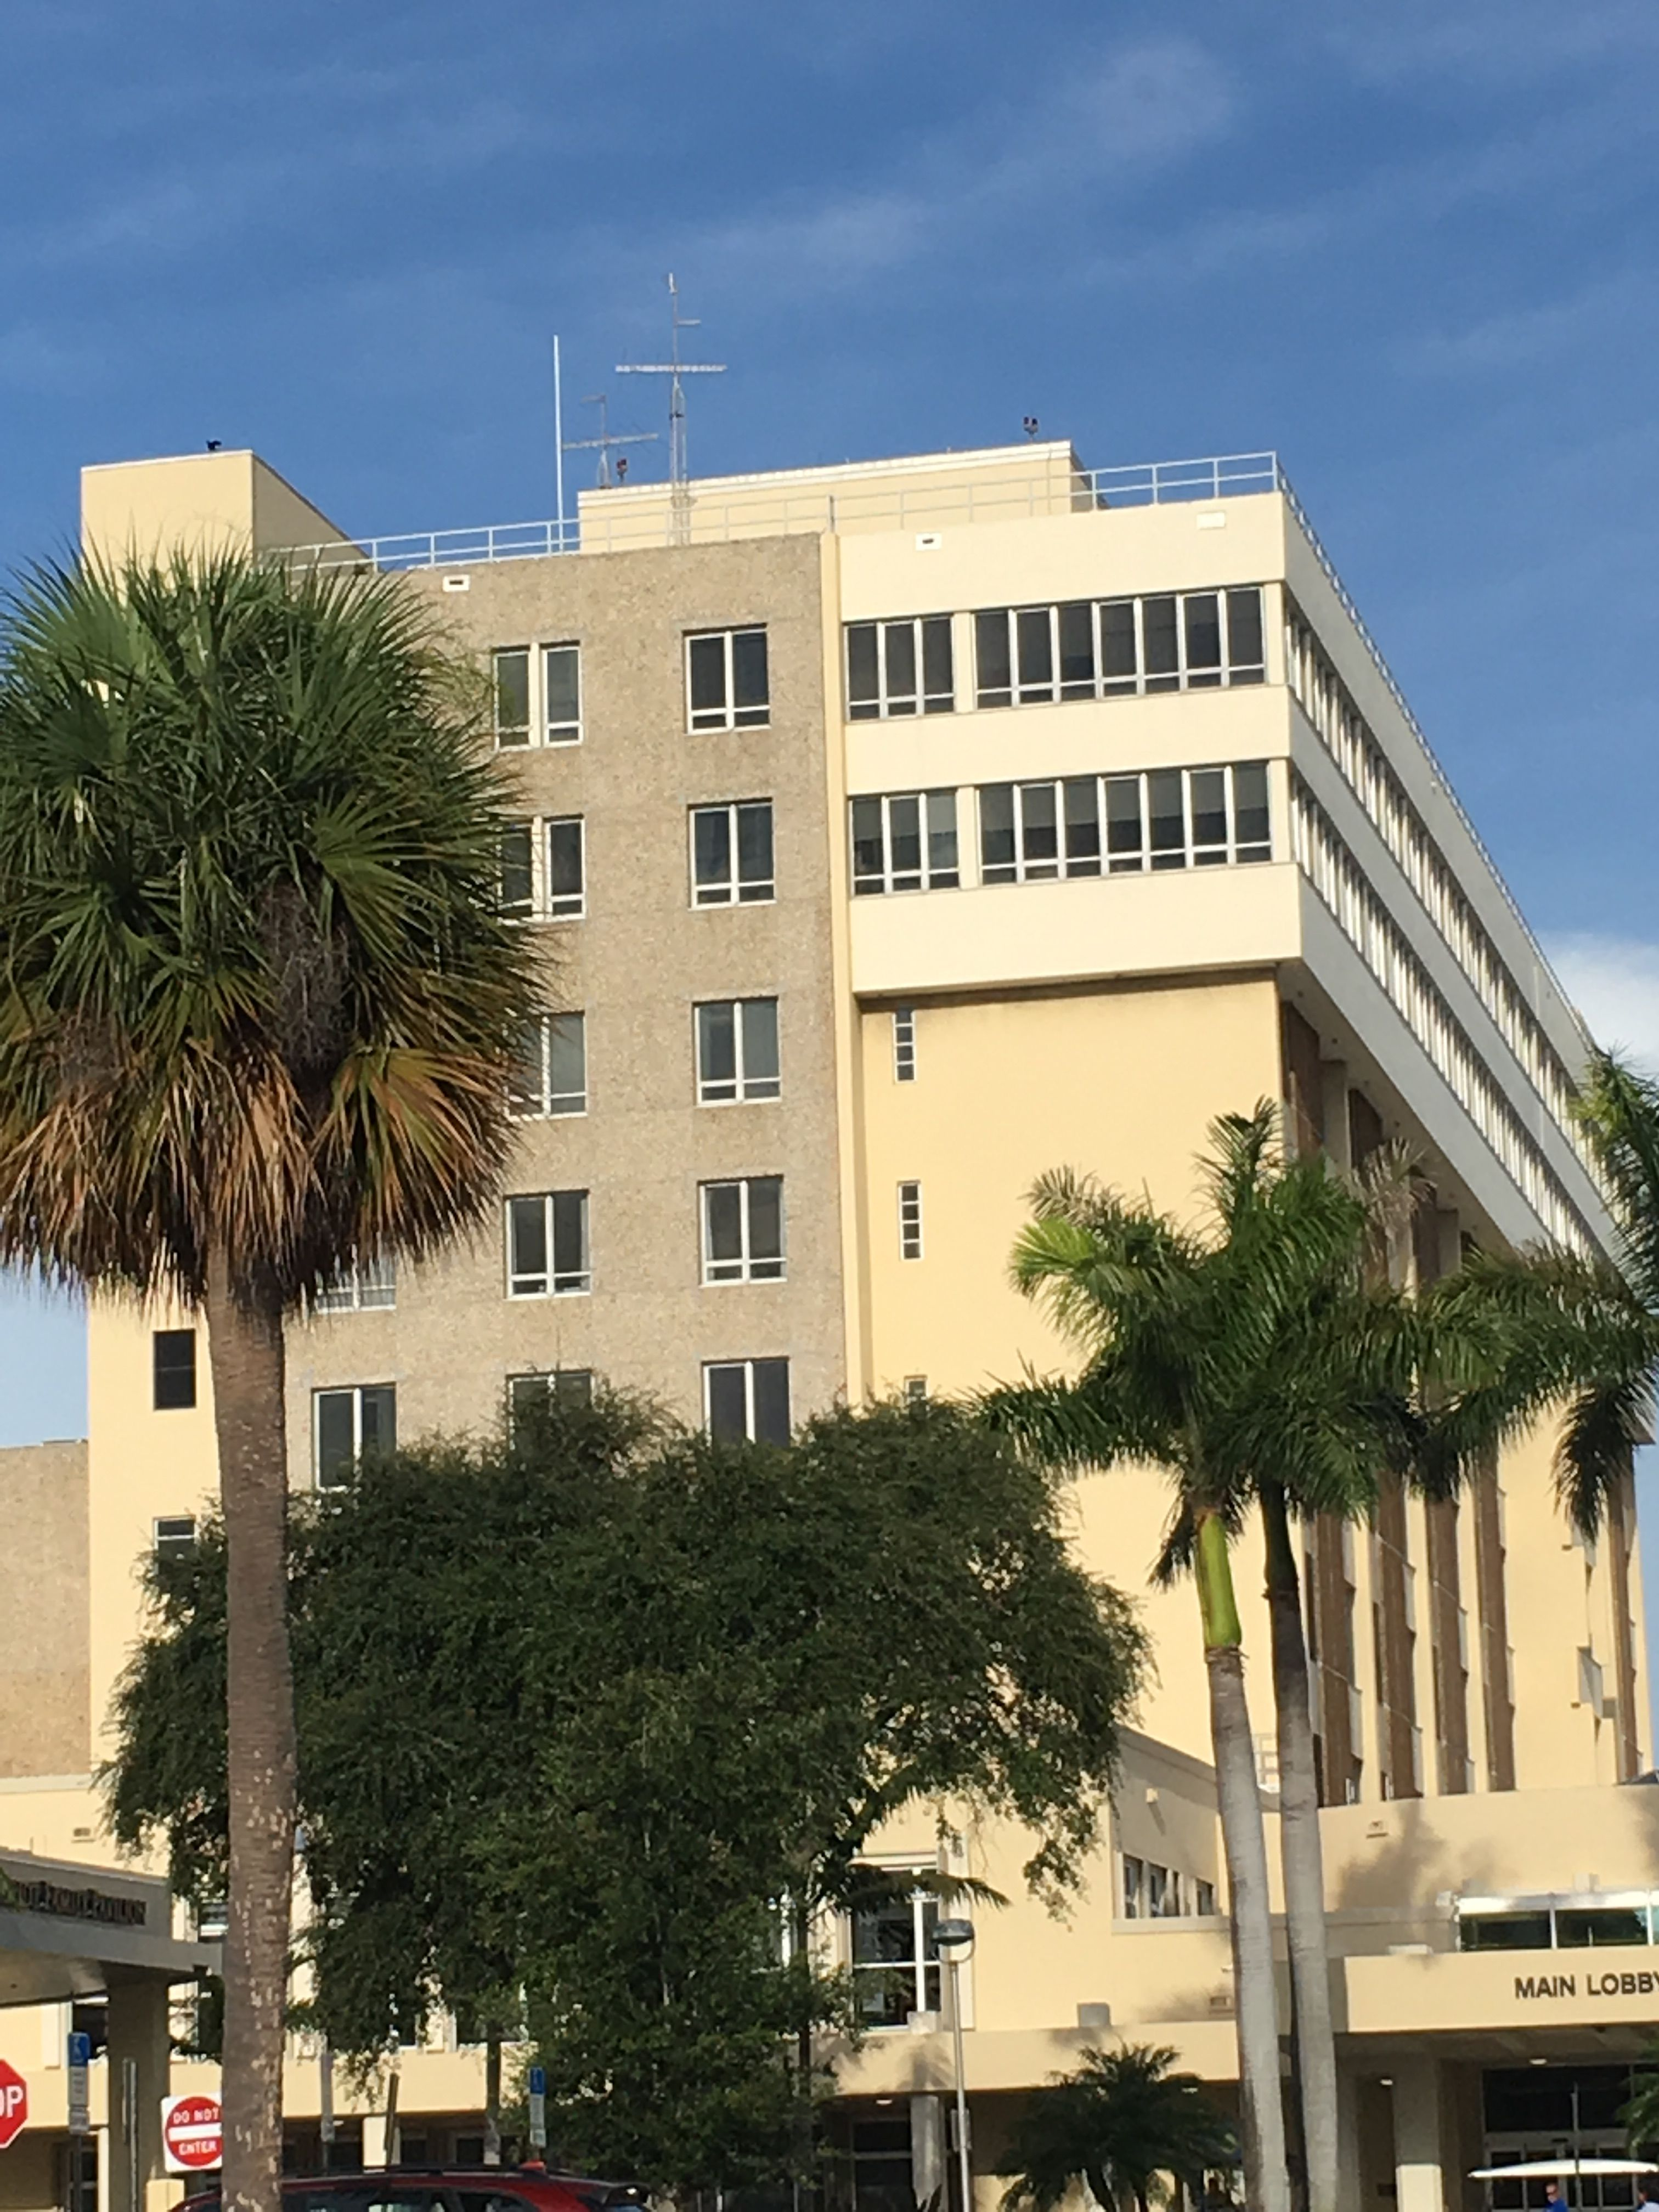 Boca raton regional hospital house styles mansions